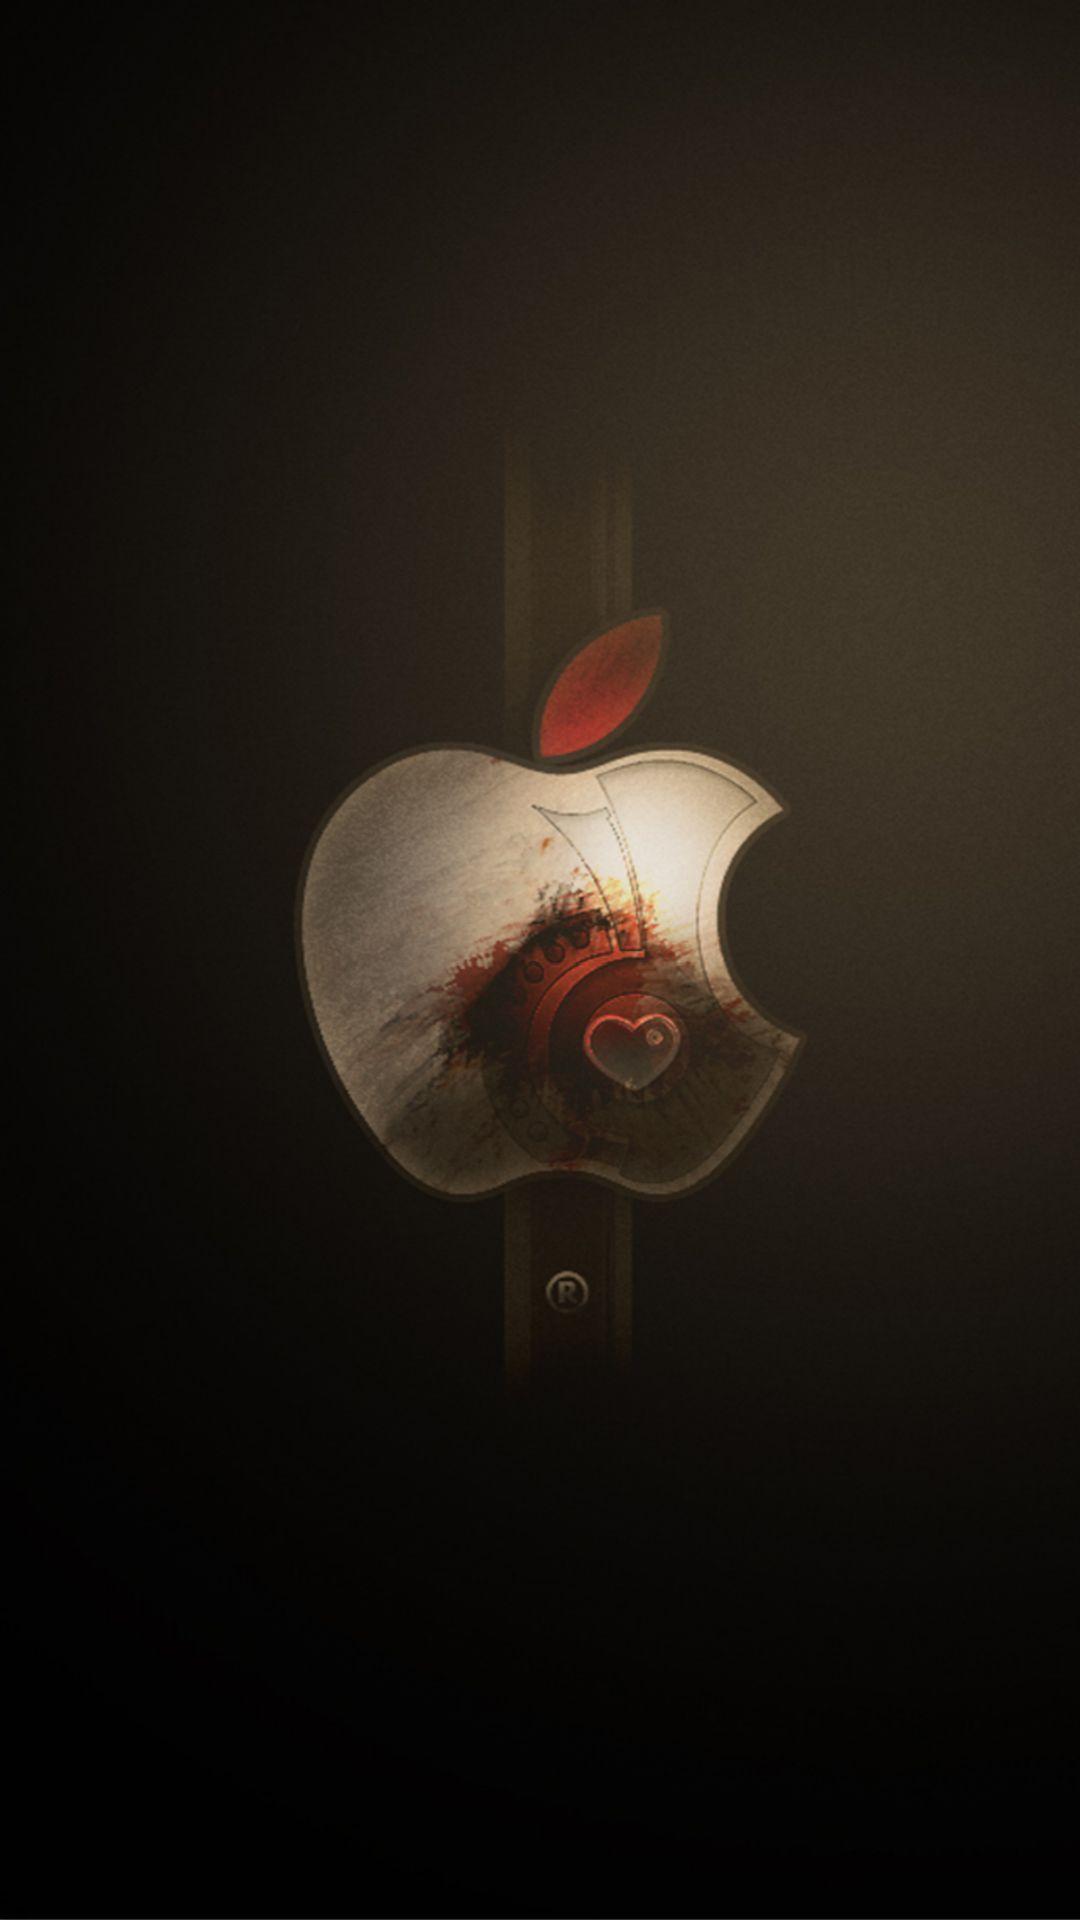 Wallpaper iphone apple logo - Apple Logo Art Landscape Iphone 6 Wallpaper